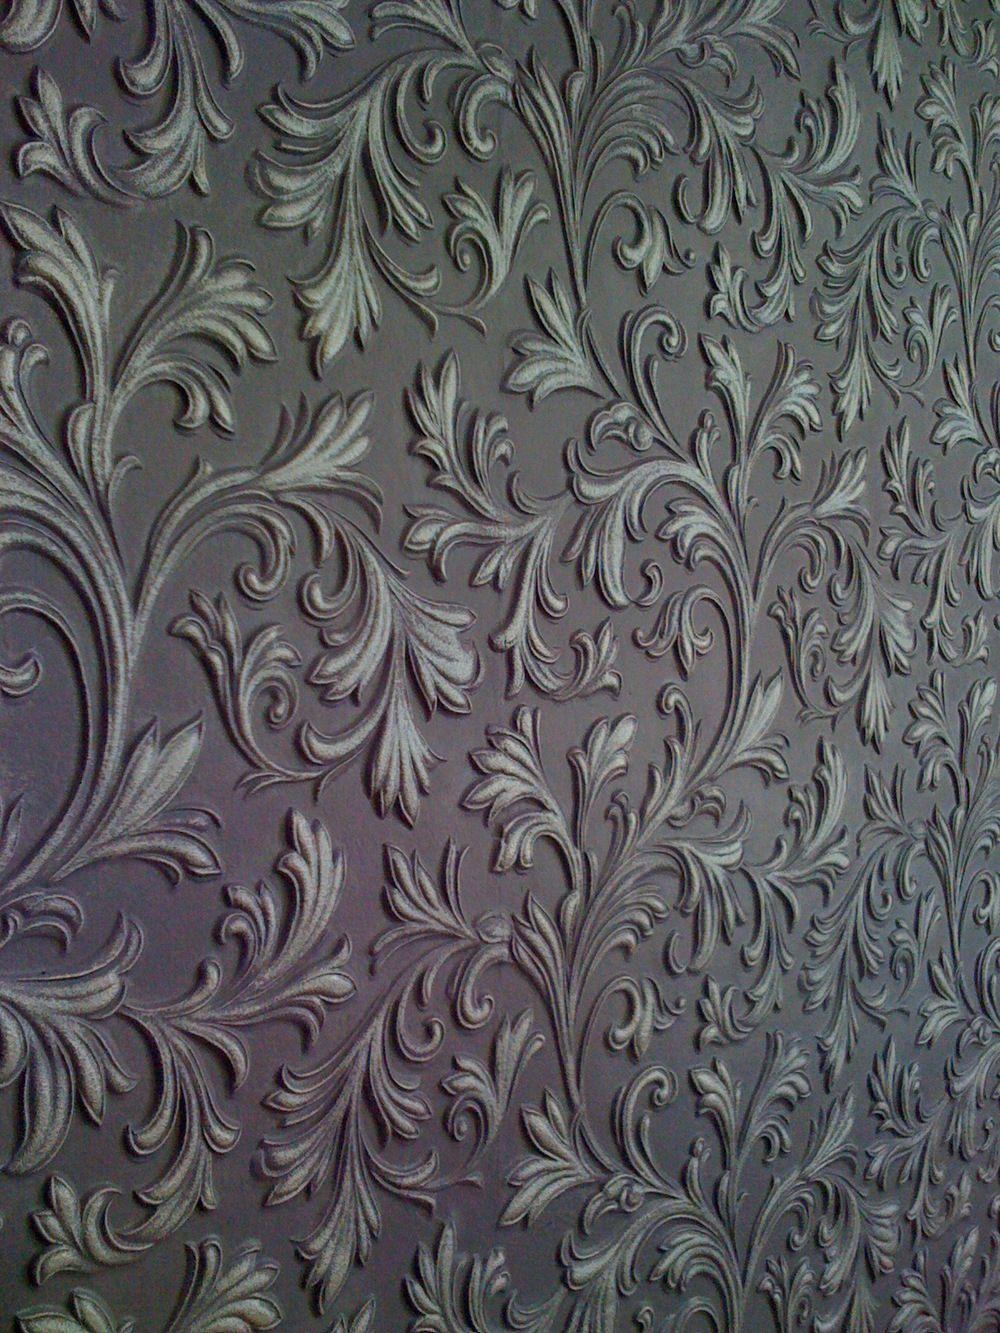 Possible Two Tone Painted Lincrusta Wallpaper Below Chair Rail